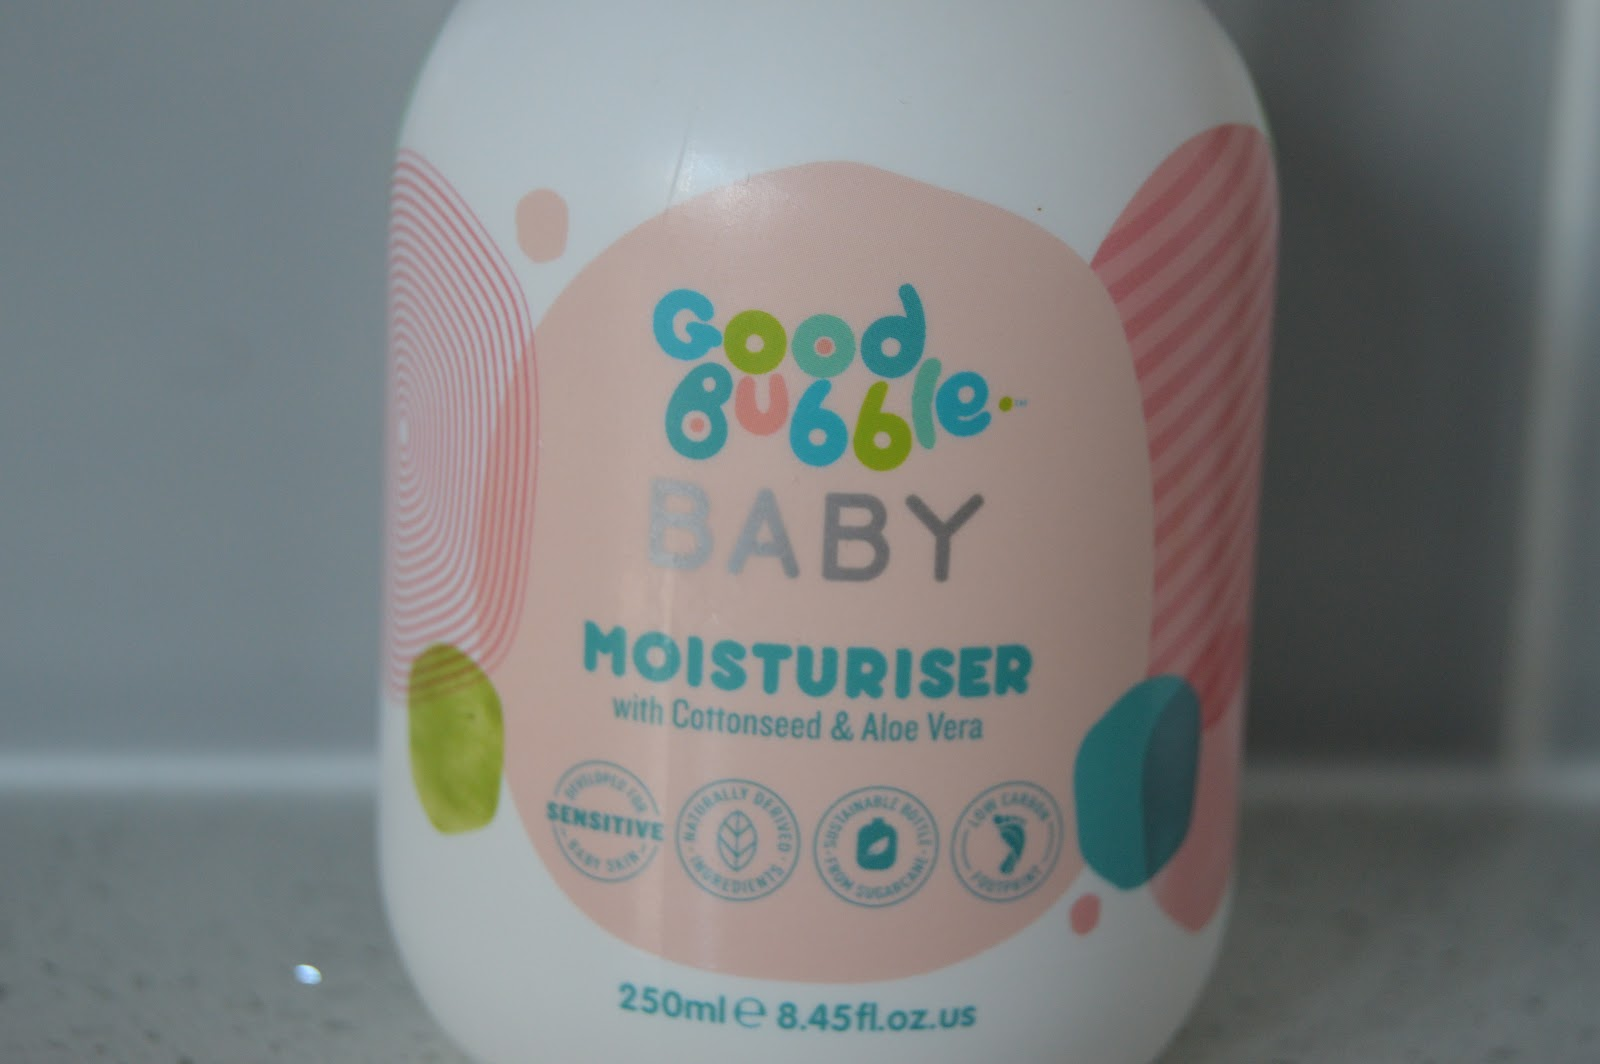 The Good Bubble Baby Range